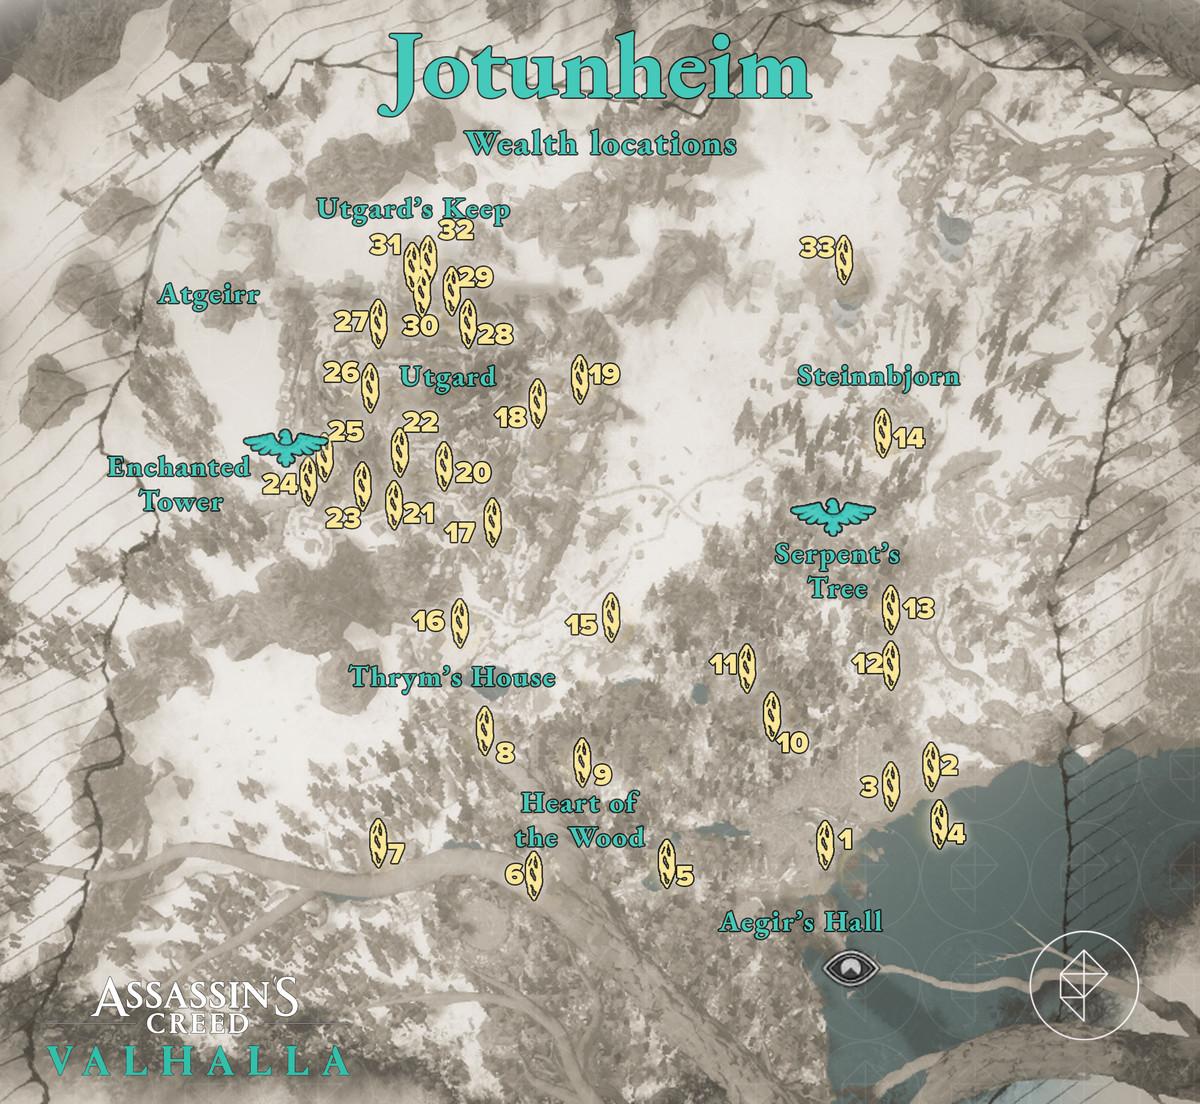 Jotunheim Wealth locations map